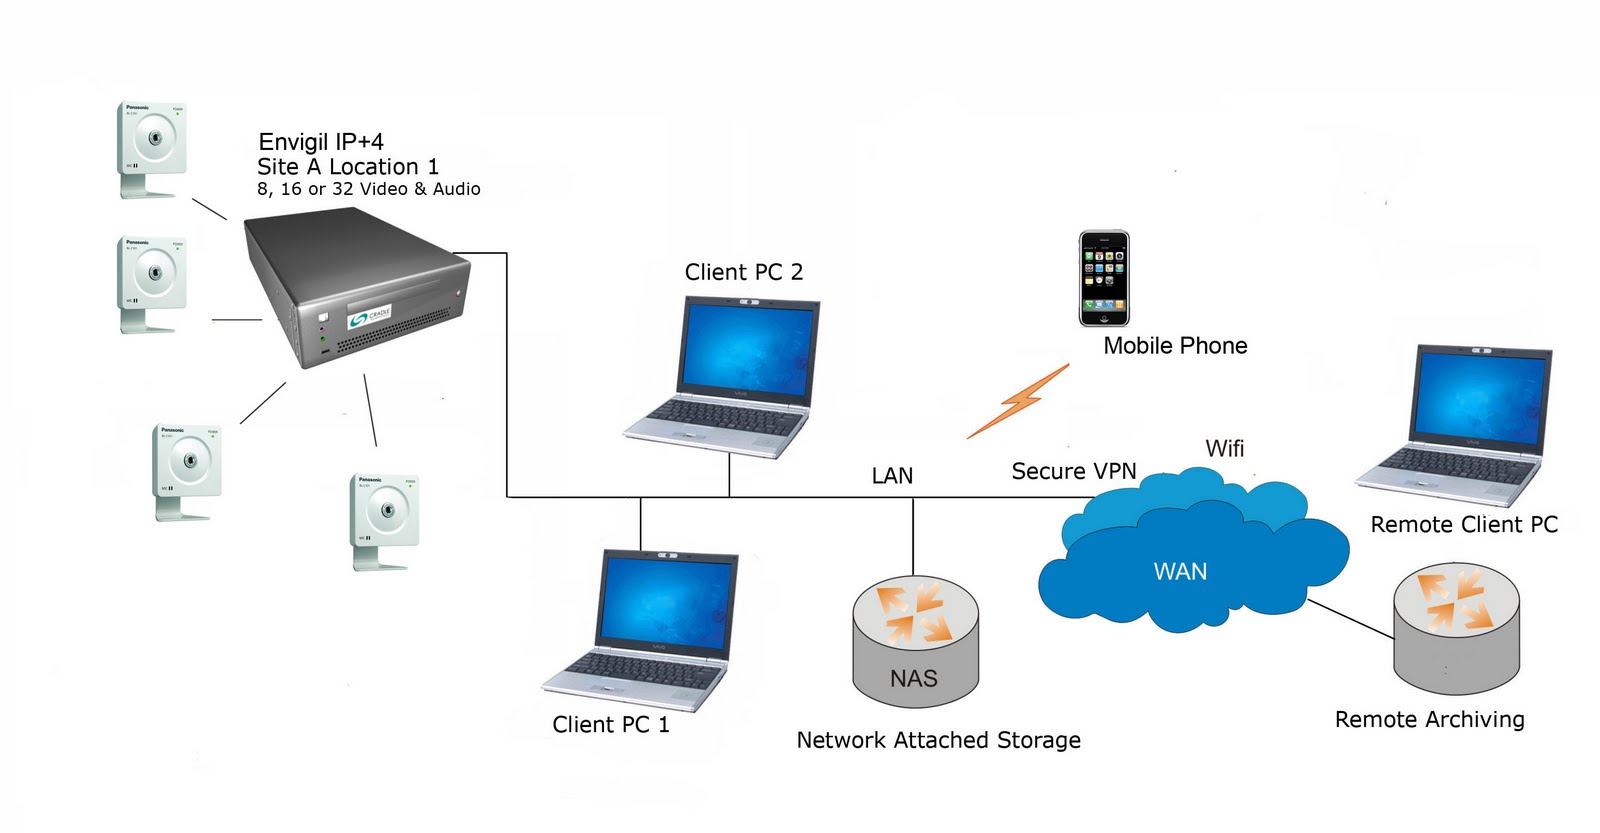 Cctv Go Beyond Security Envigil Ip Is The Best Nvr